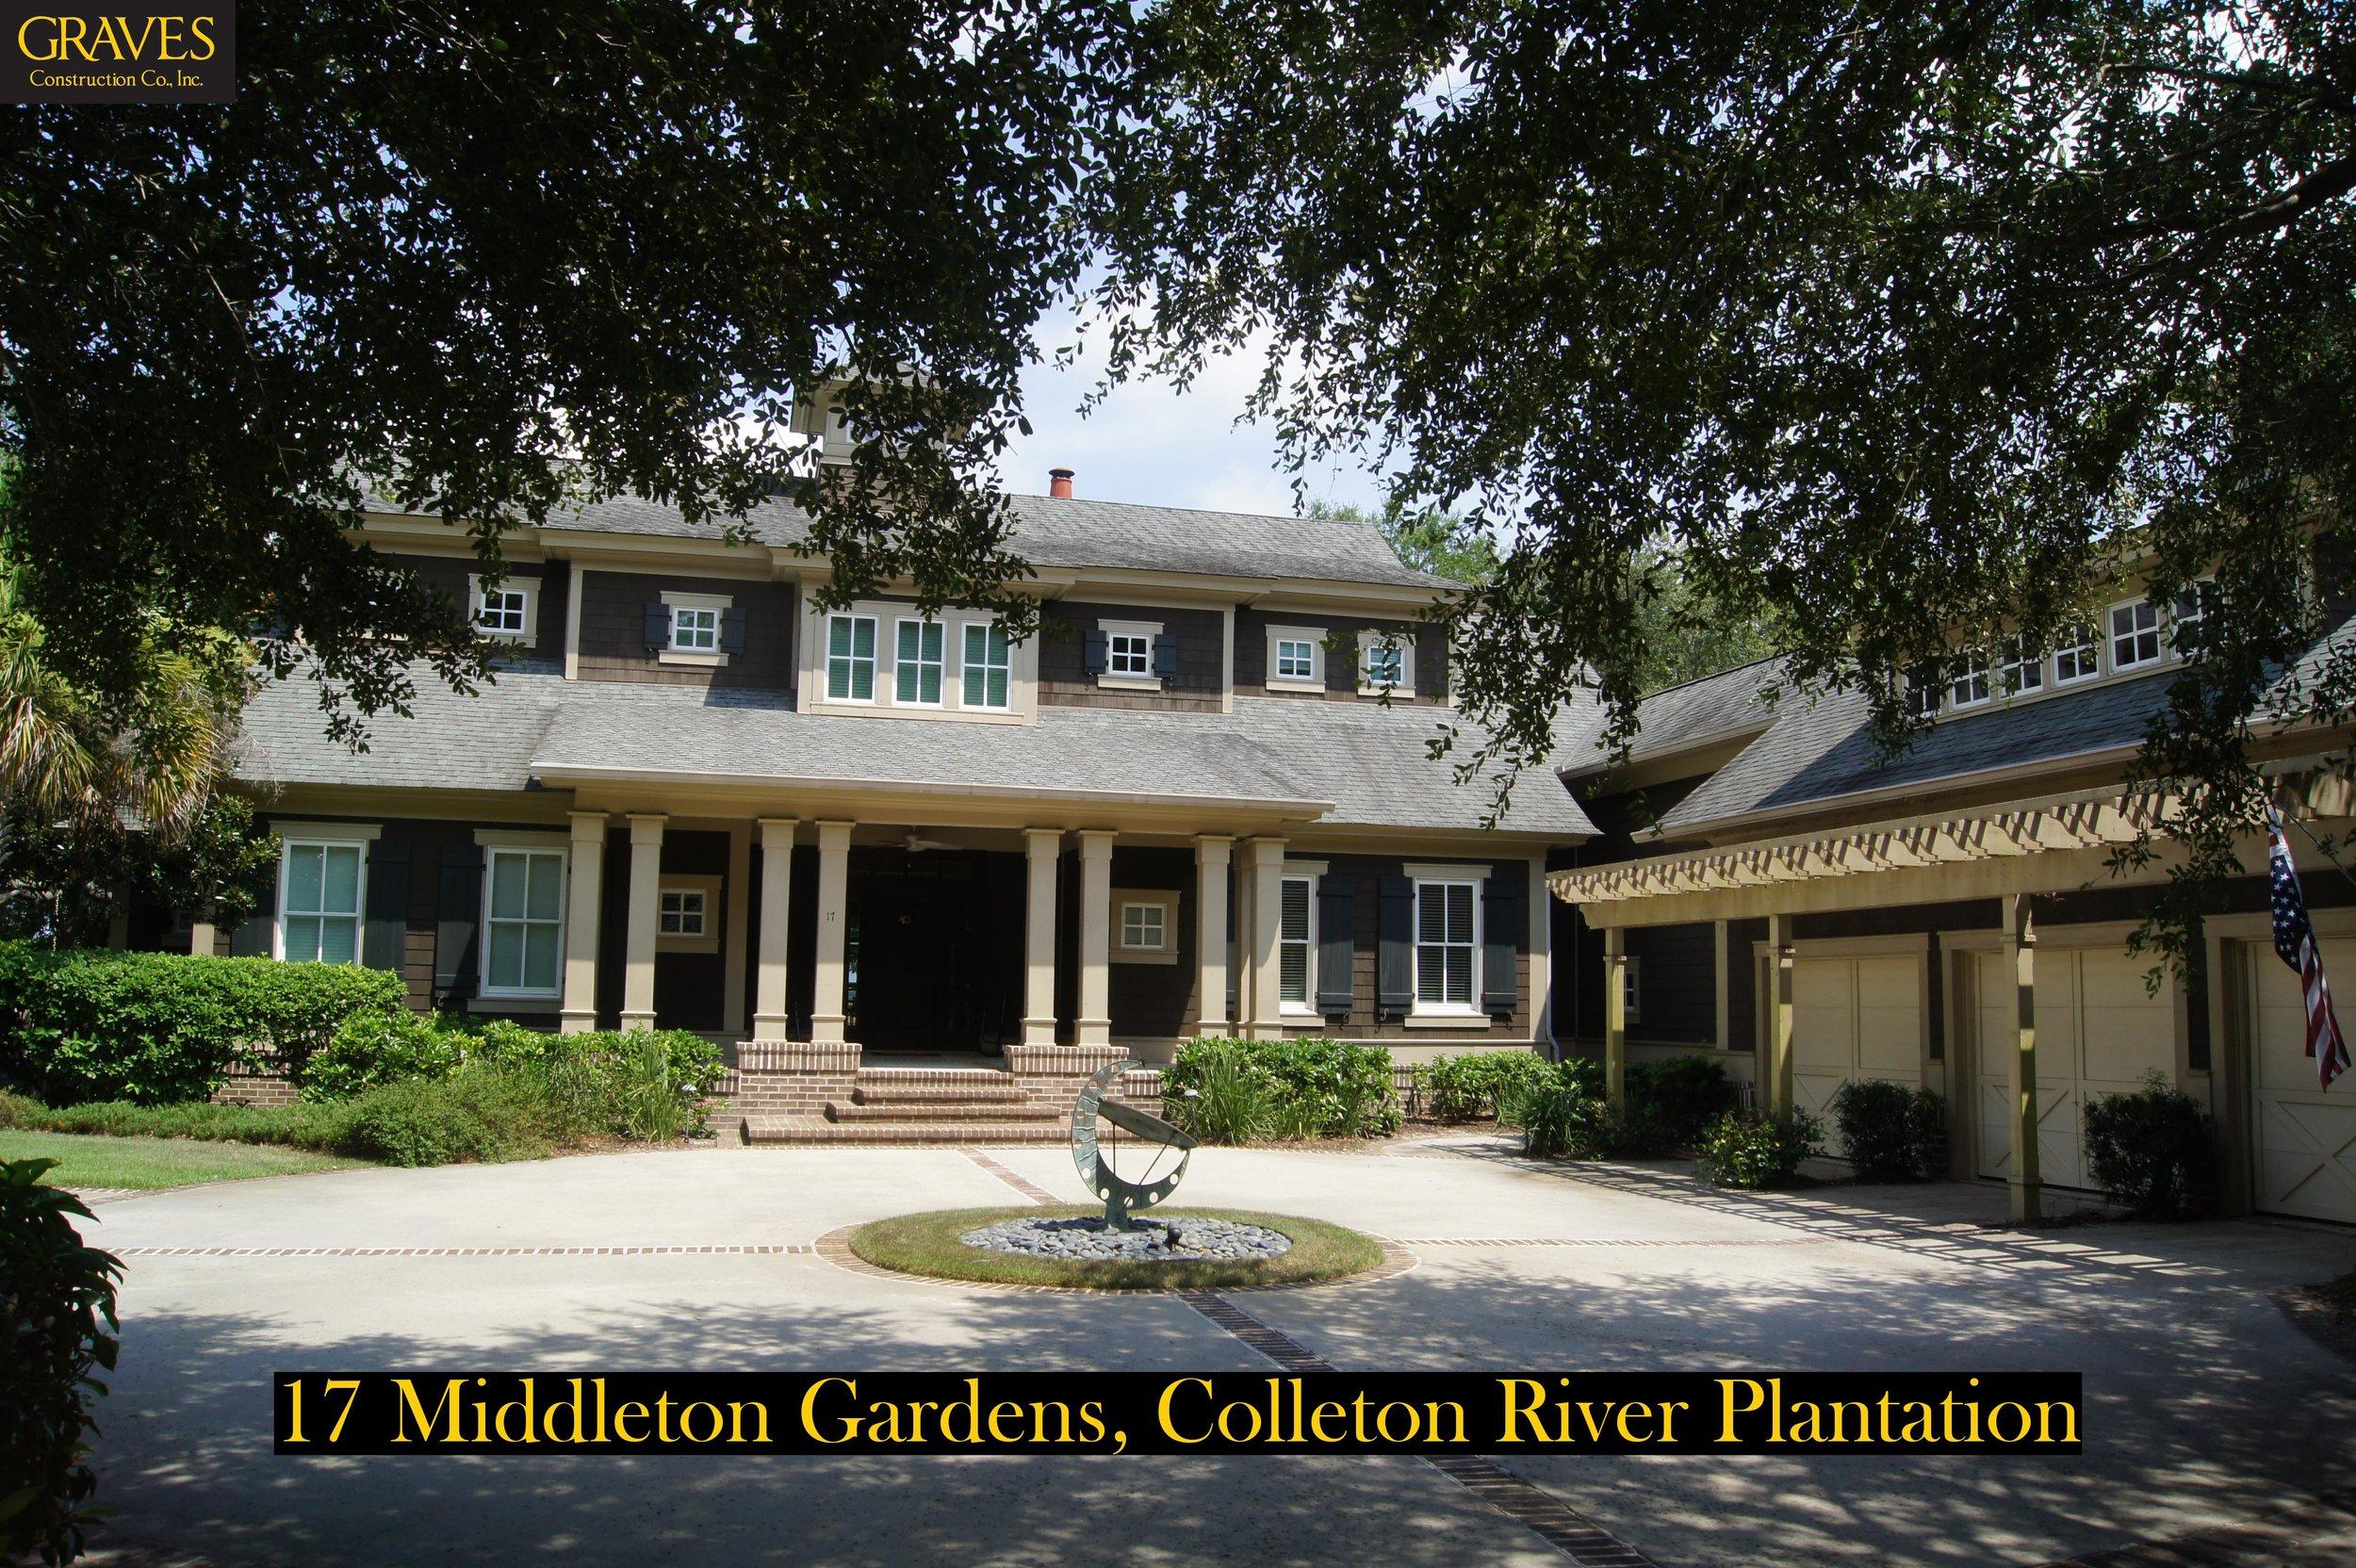 17 Middleton Gardens - 2